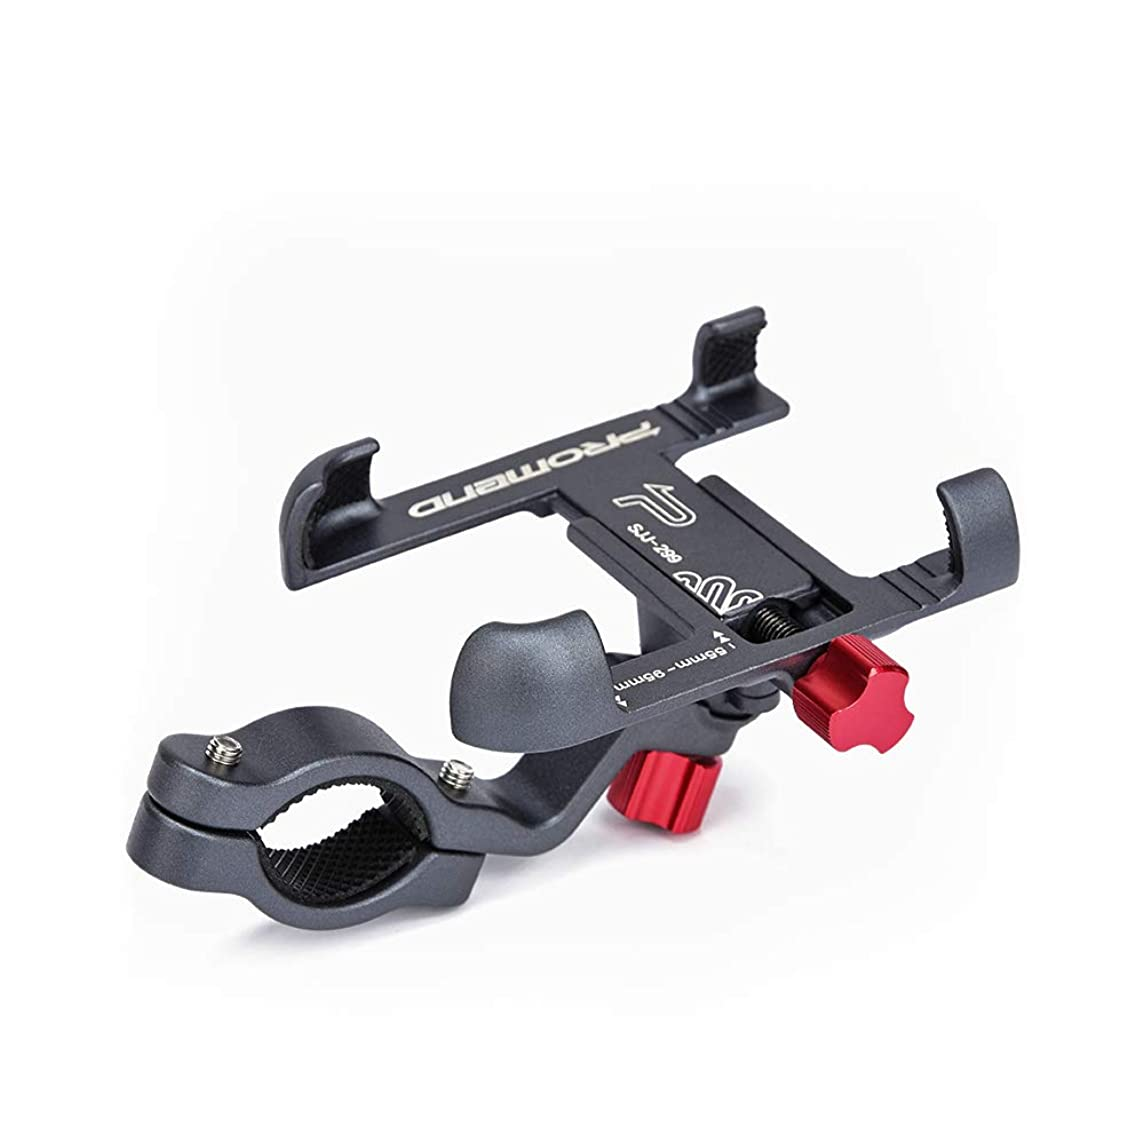 Promend Universal Aluminium Bike Phone Mount, Adjustable from 2.2-3.7